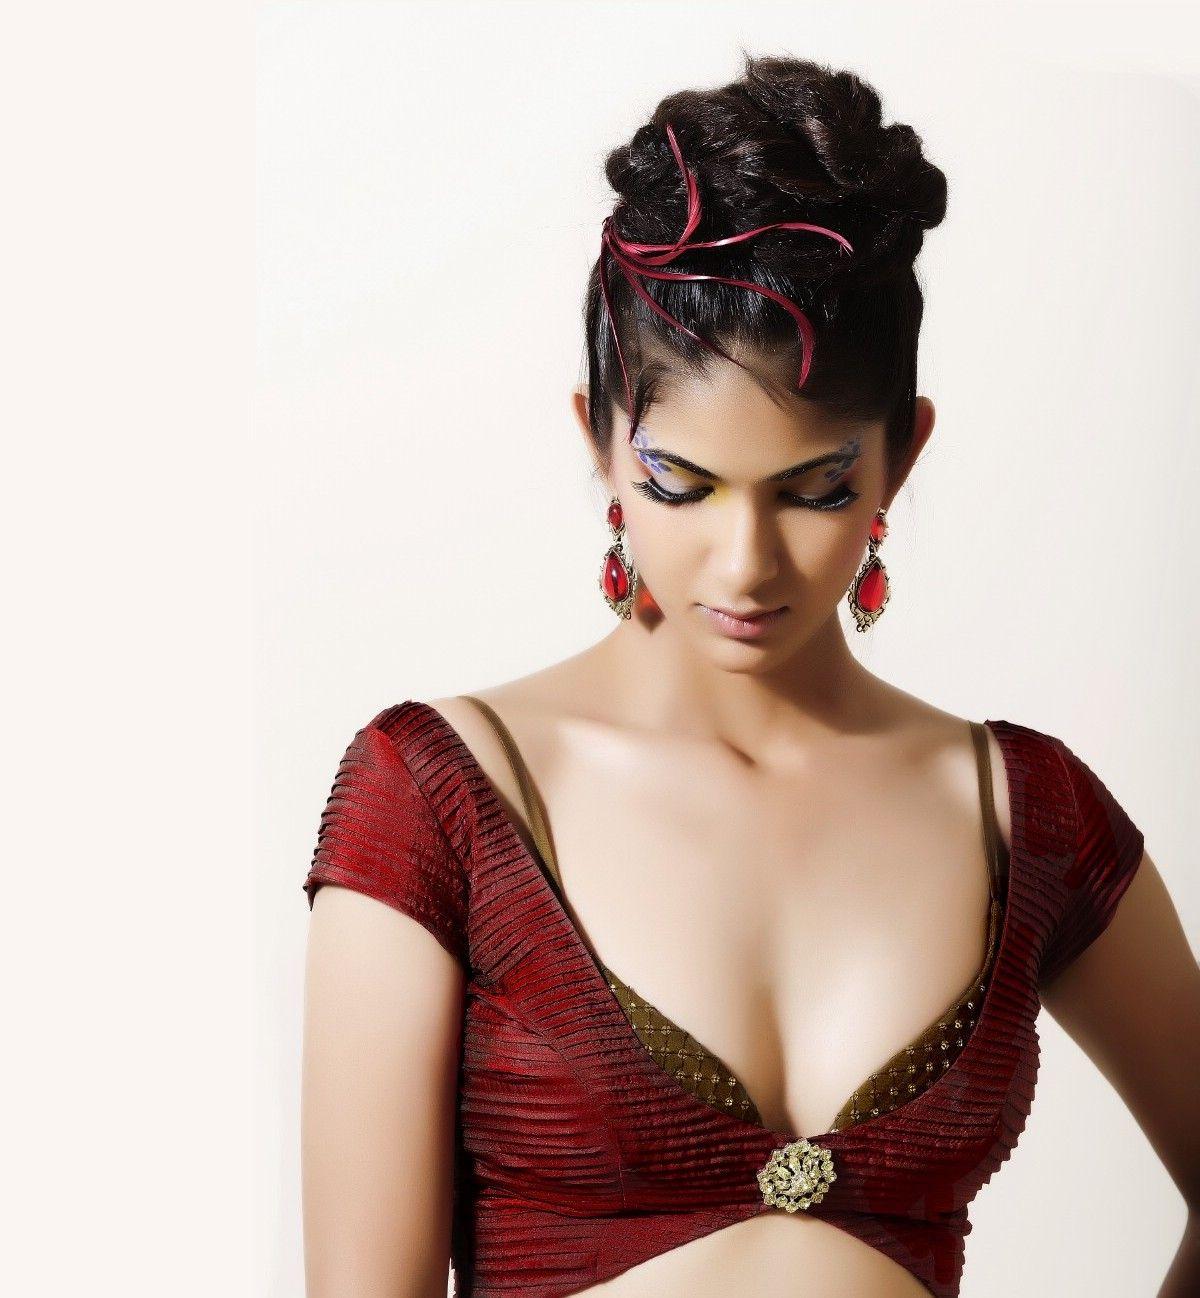 South Indian Actress Hd Wallpapers Hot Wallpaper